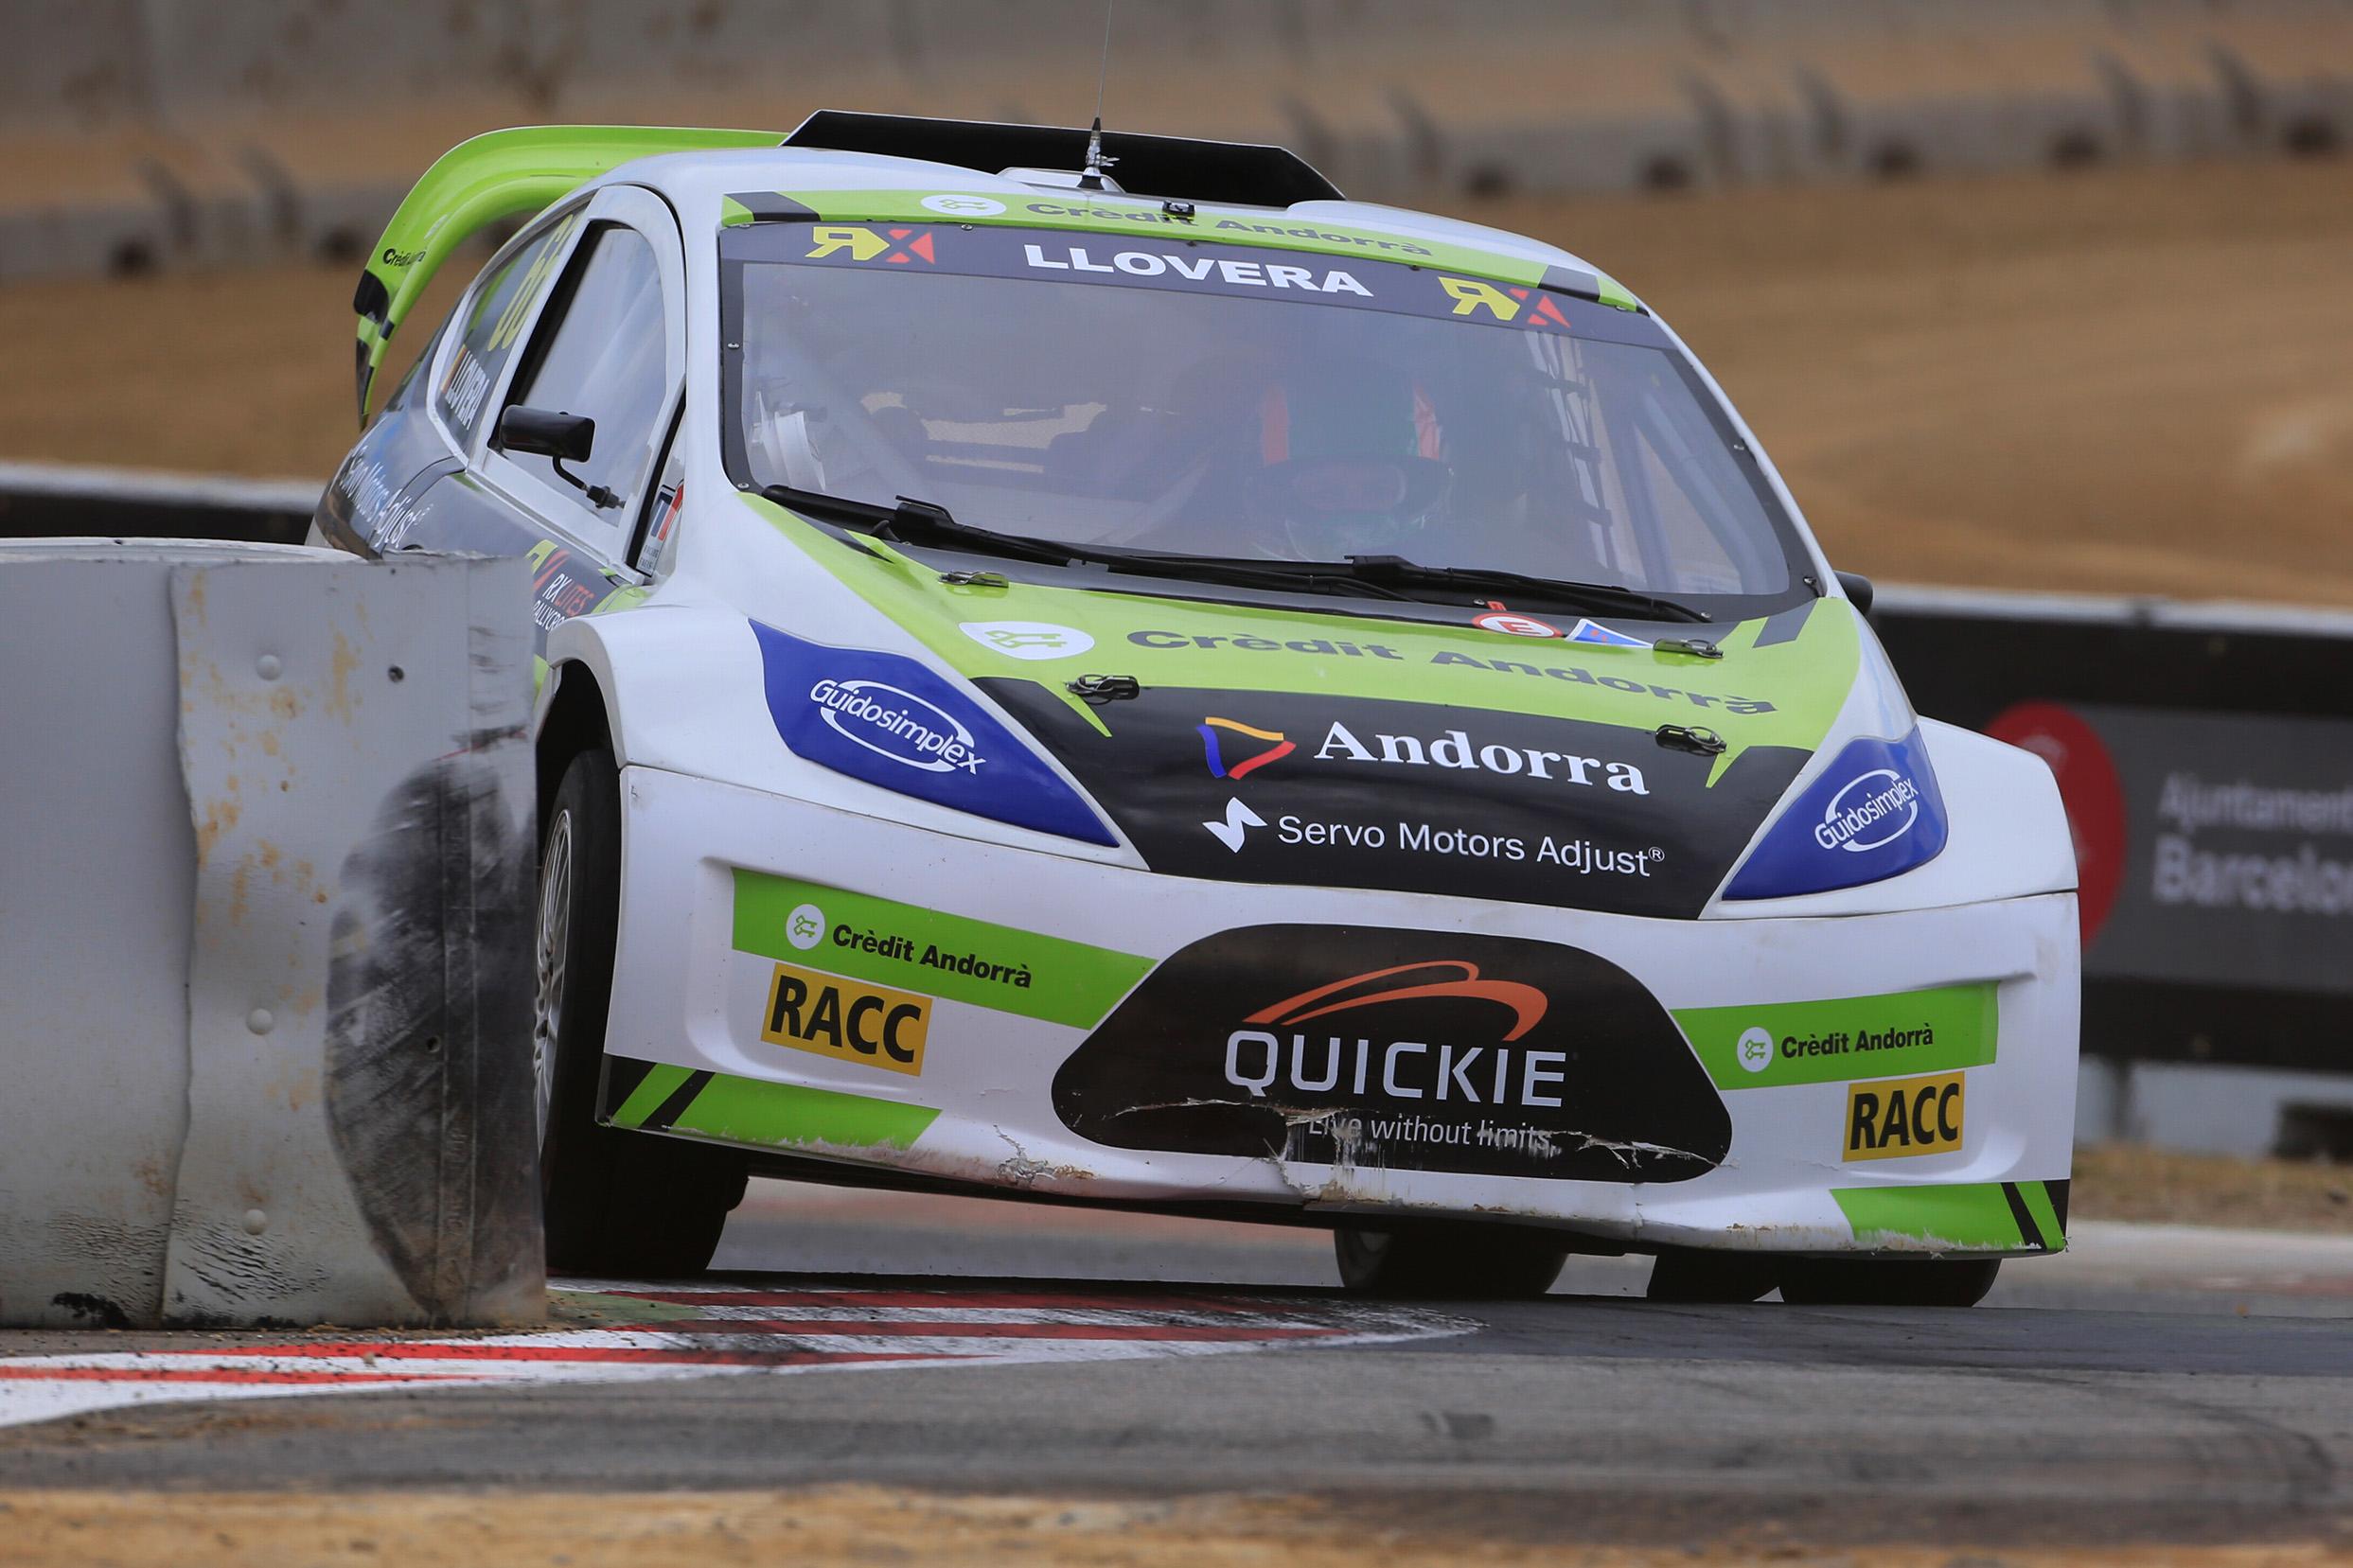 Albert Llovera vuelve con fuerza al Mundial de Rallycross